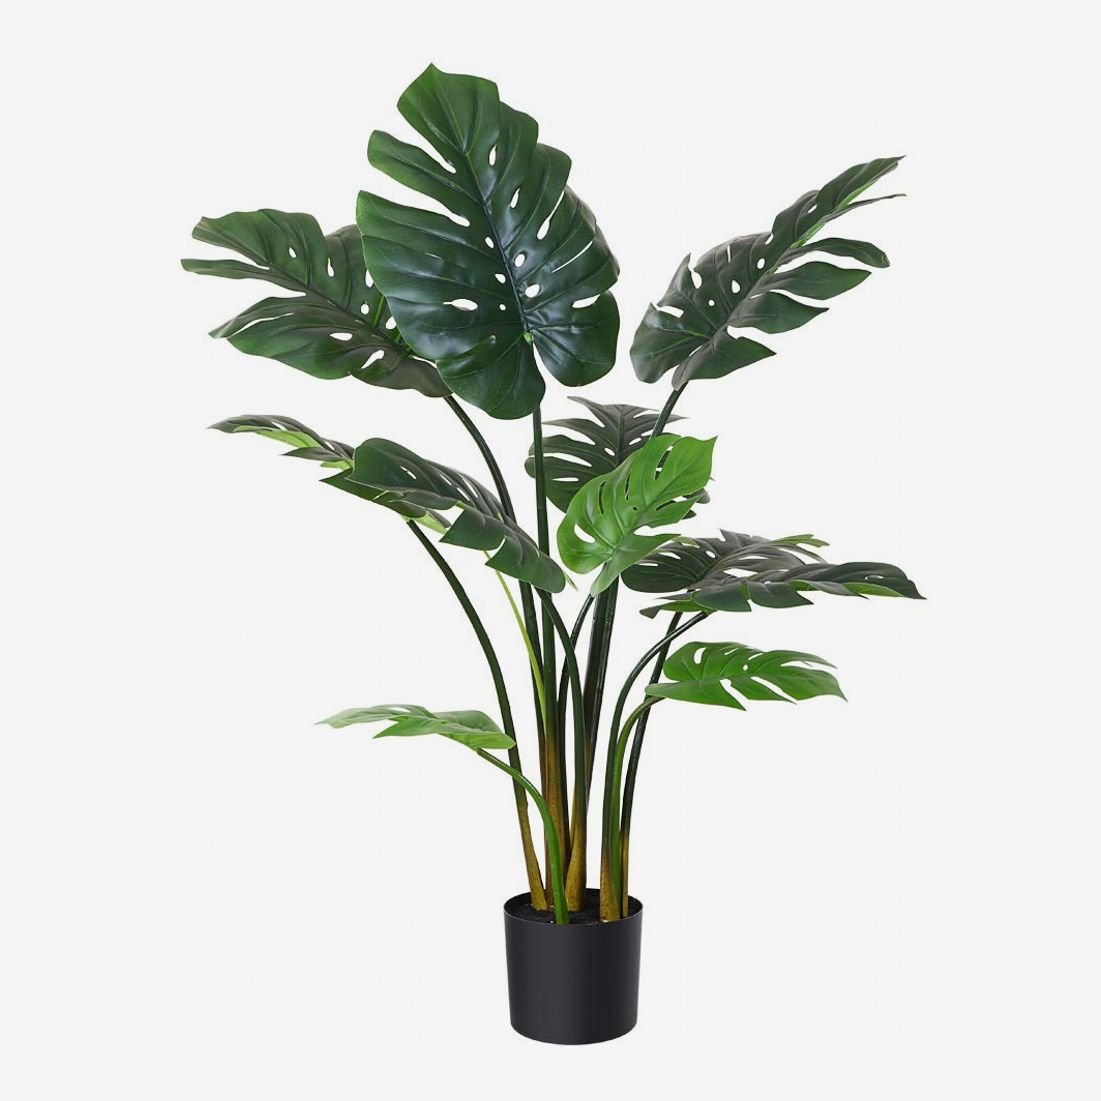 34 Best Artificial Plants 2021 The Strategist New York Magazine